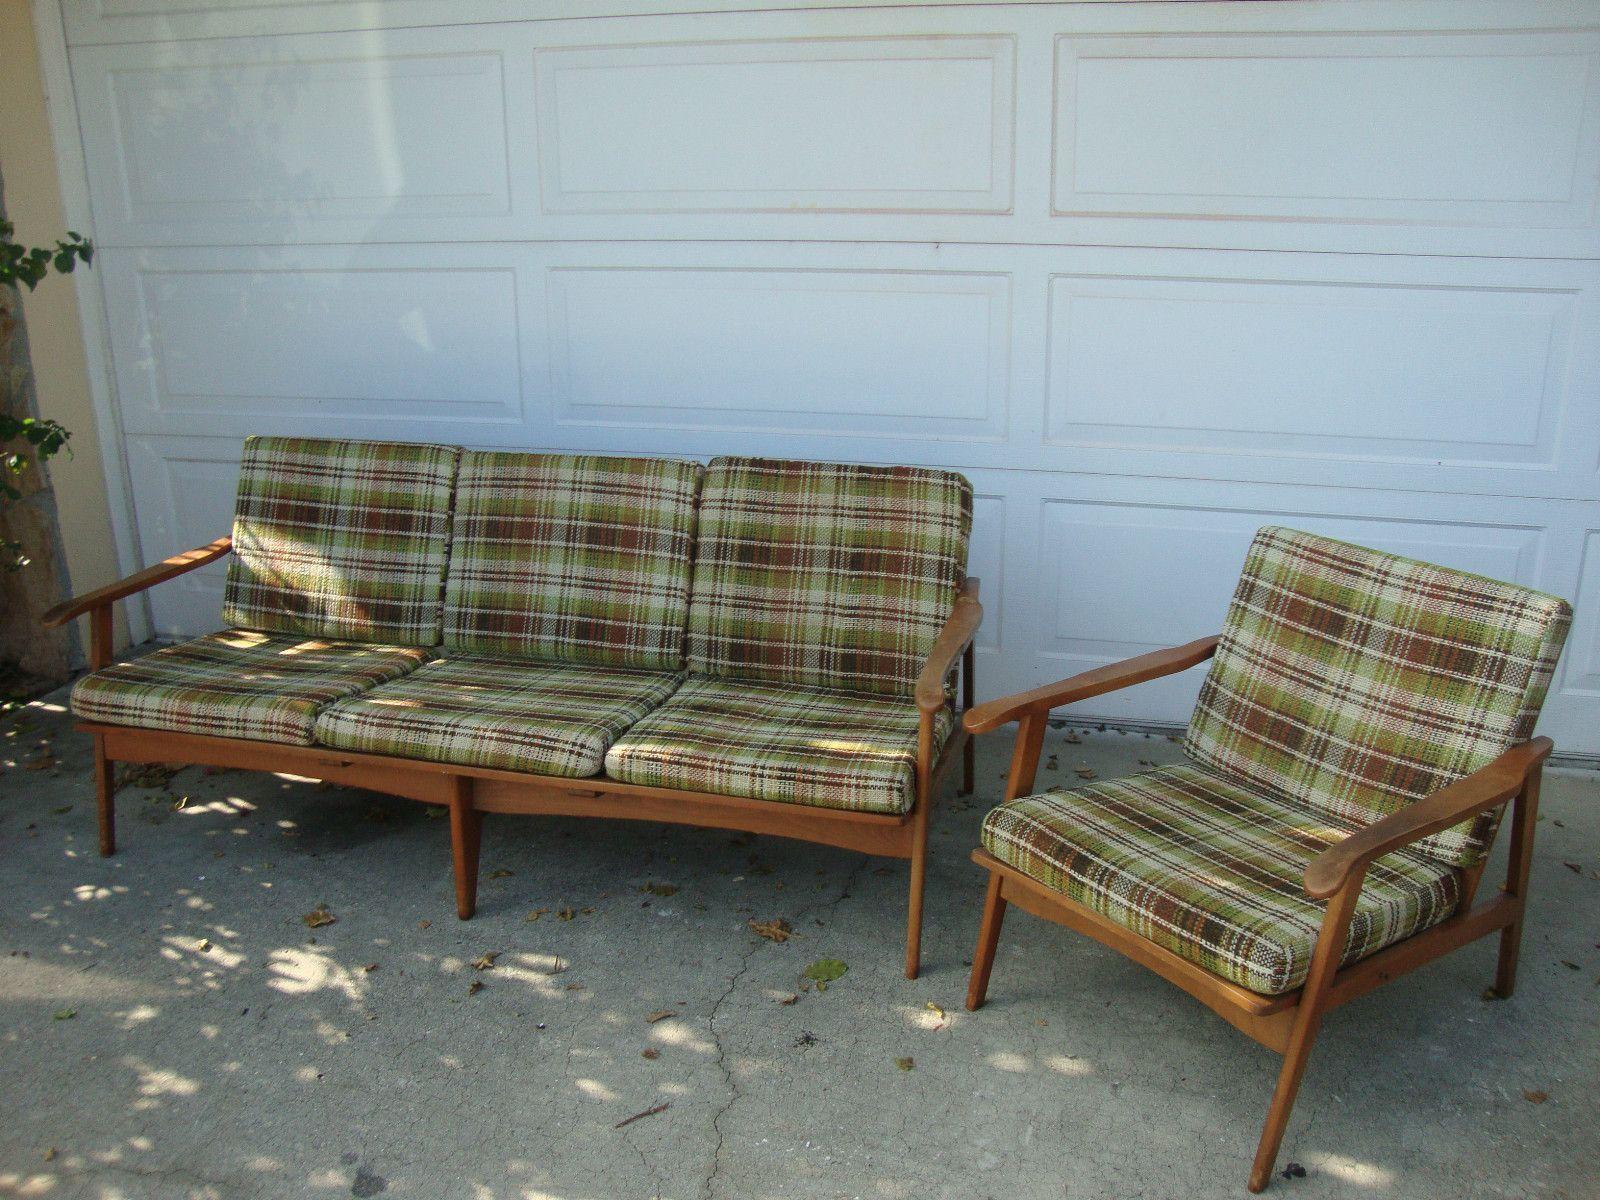 Danish Modern Eames Era Mid Century Matching Sofa & Chair made in